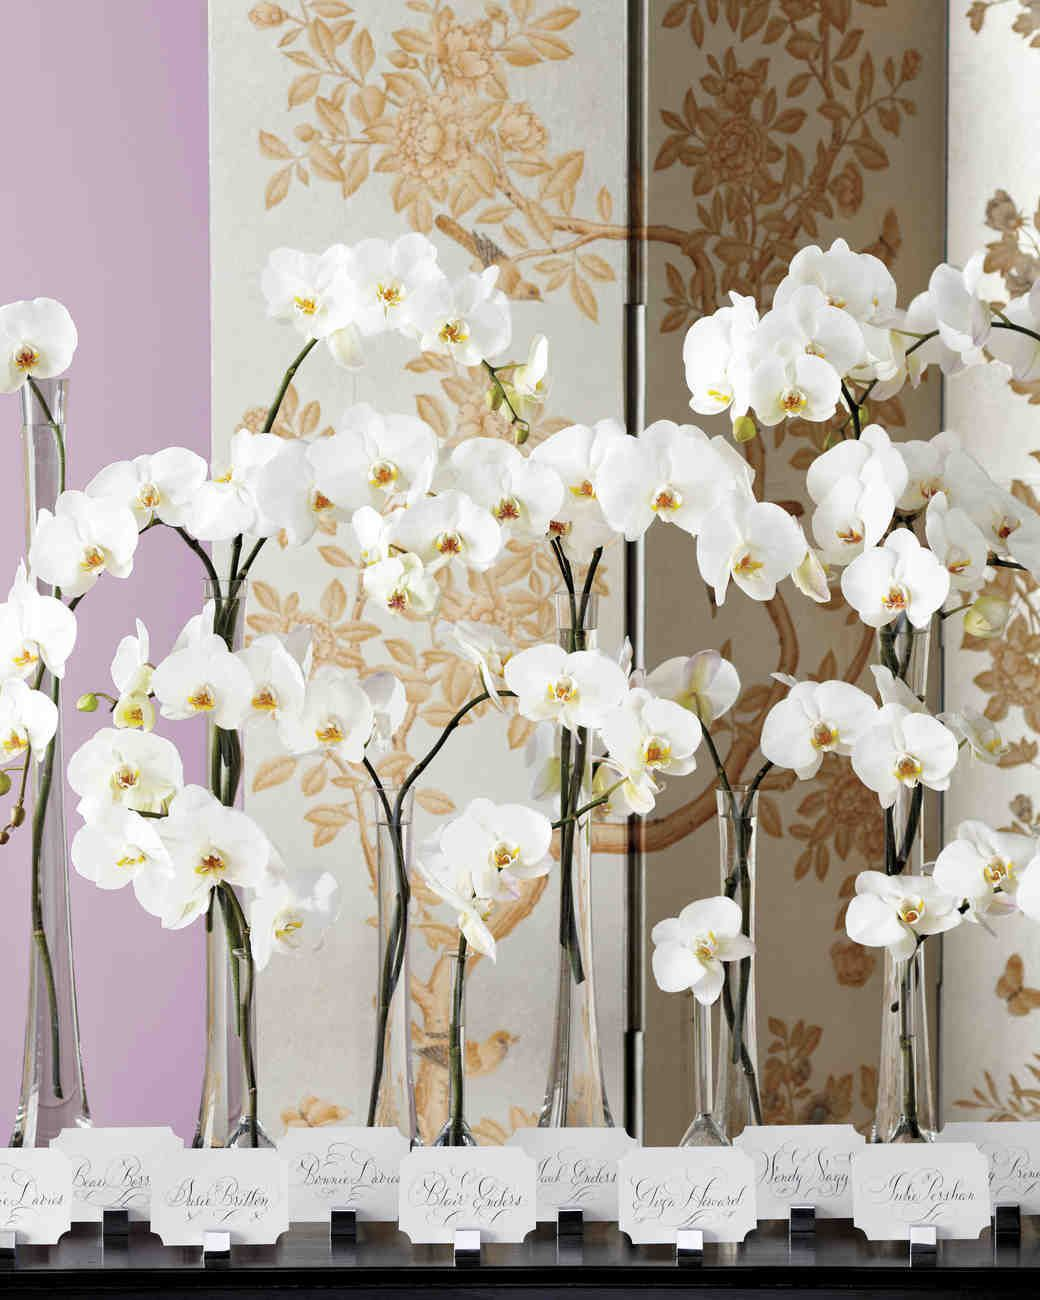 Cool-Weather Wedding Flowers | Pinterest | Martha stewart weddings ...